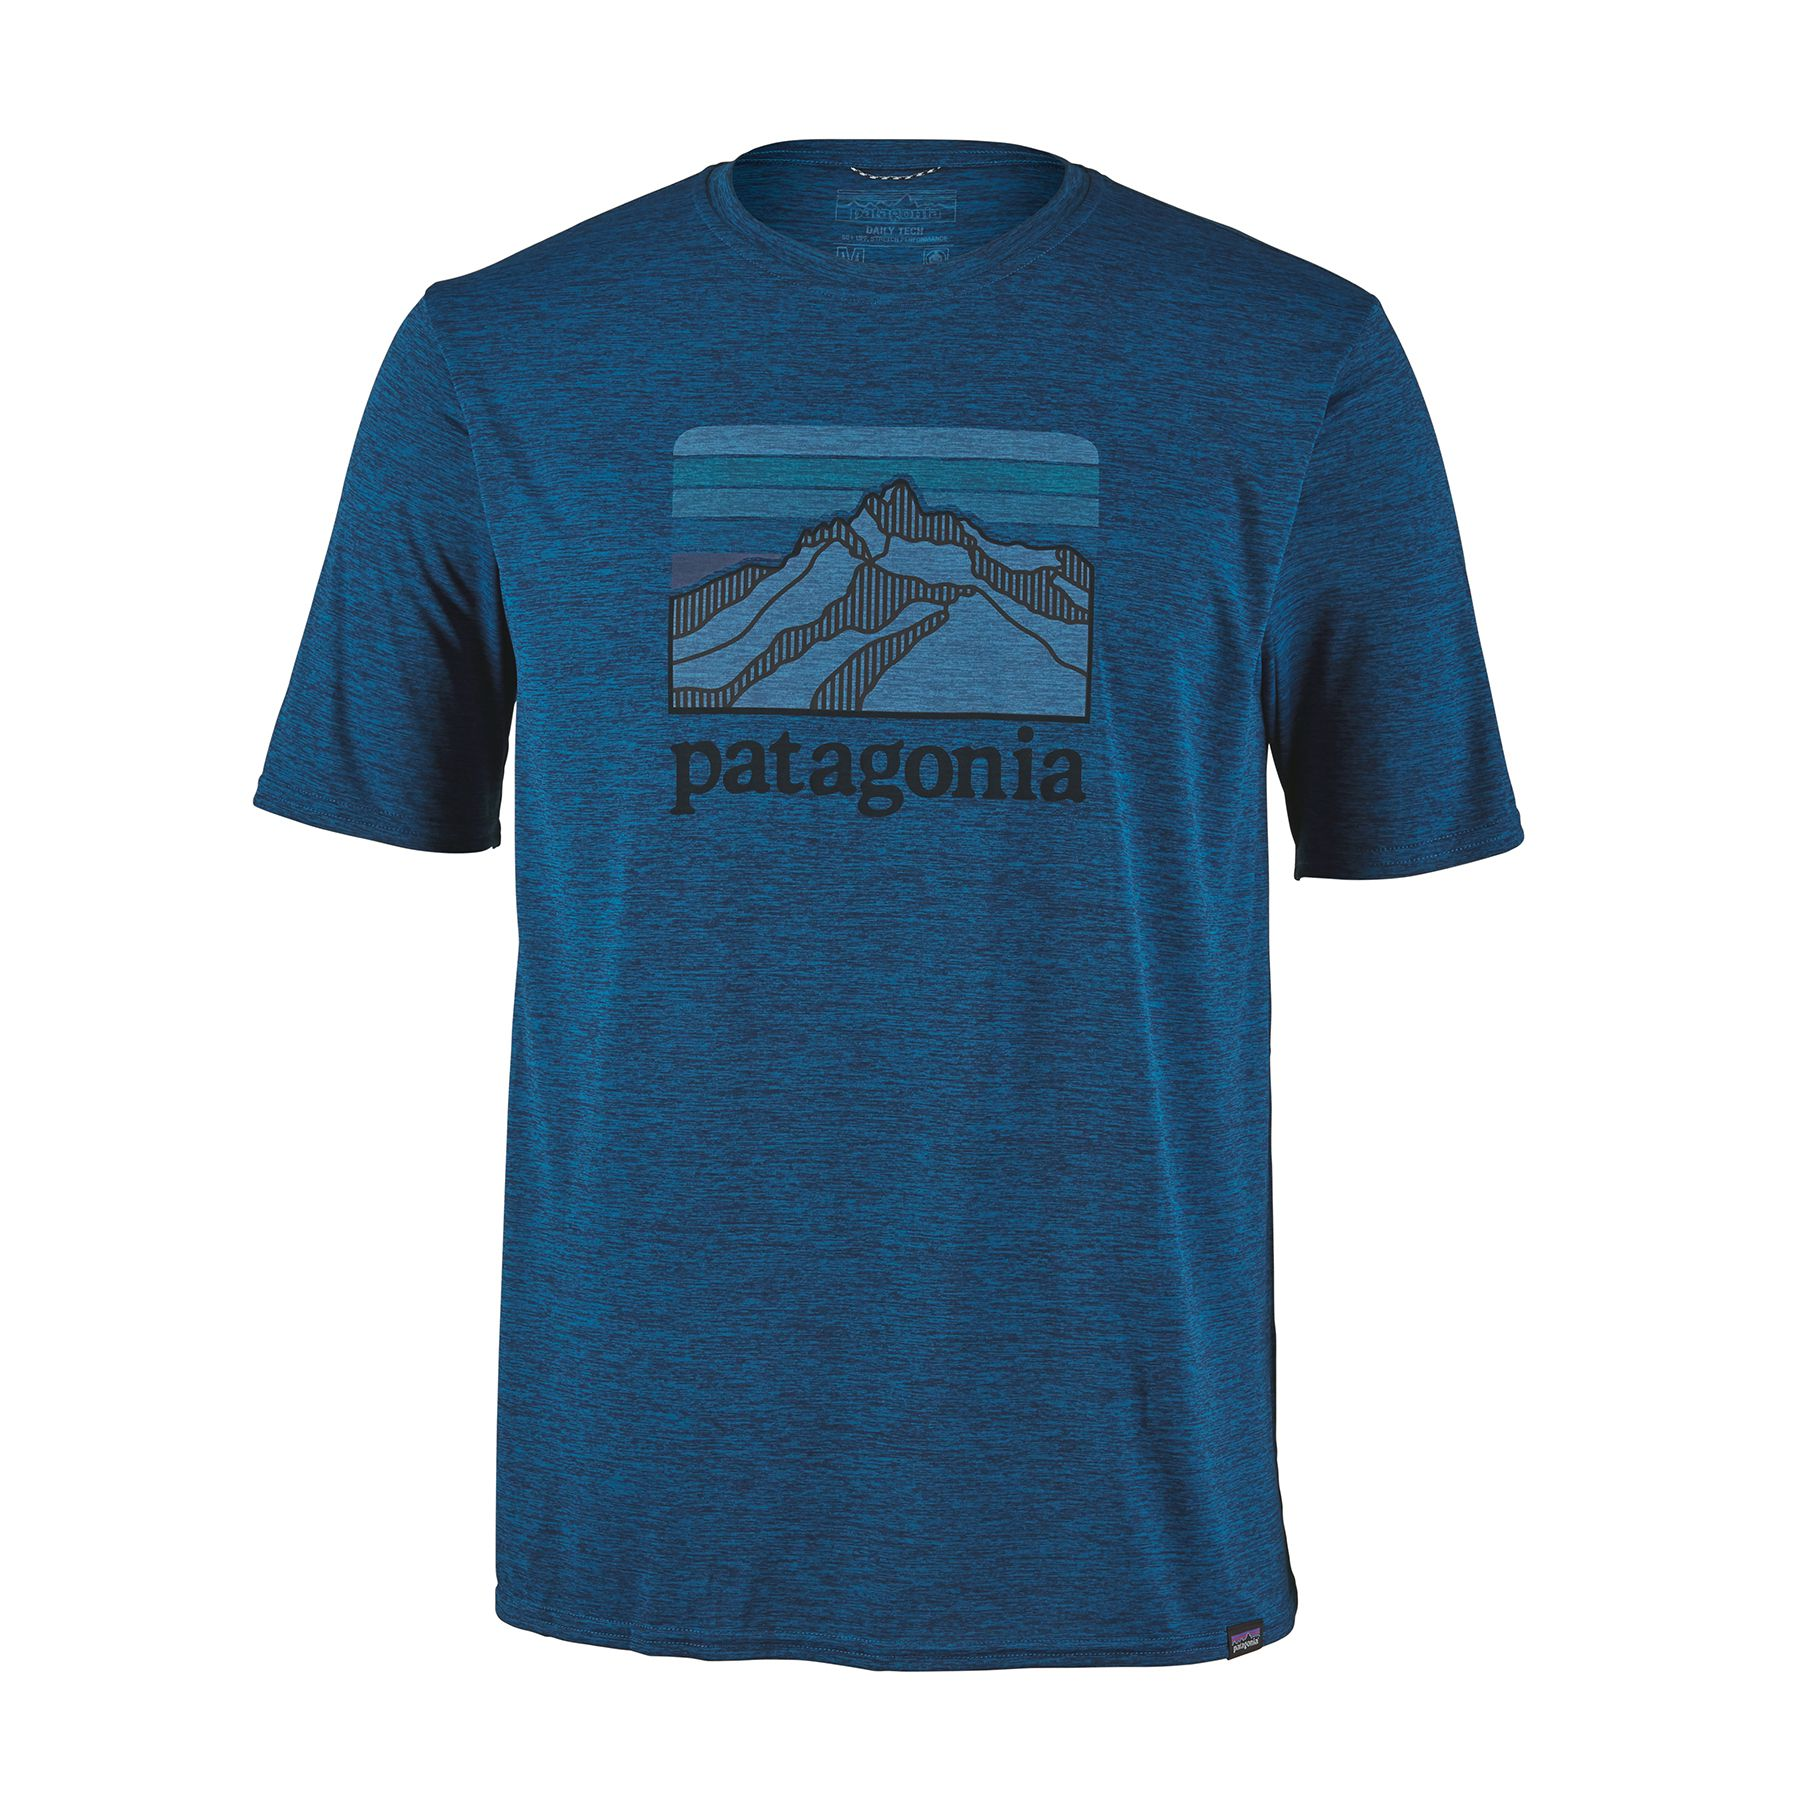 Cap Cool Daily Graphic Shirt - Men's